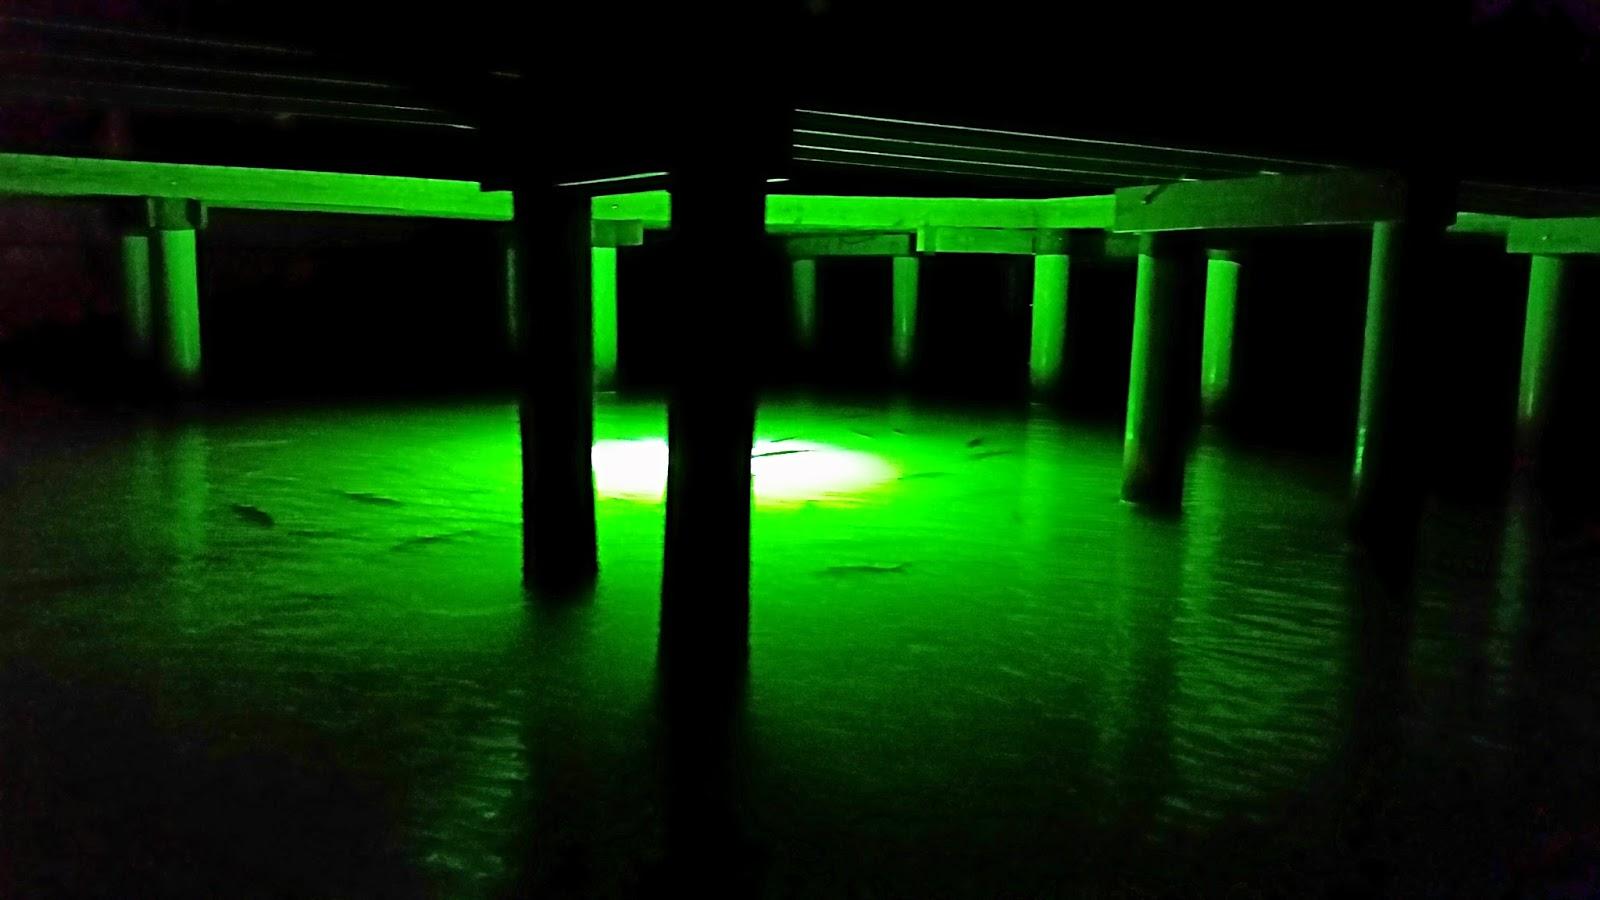 Southern kayak kronicles night fishing around lighted for Kayak lights for night fishing